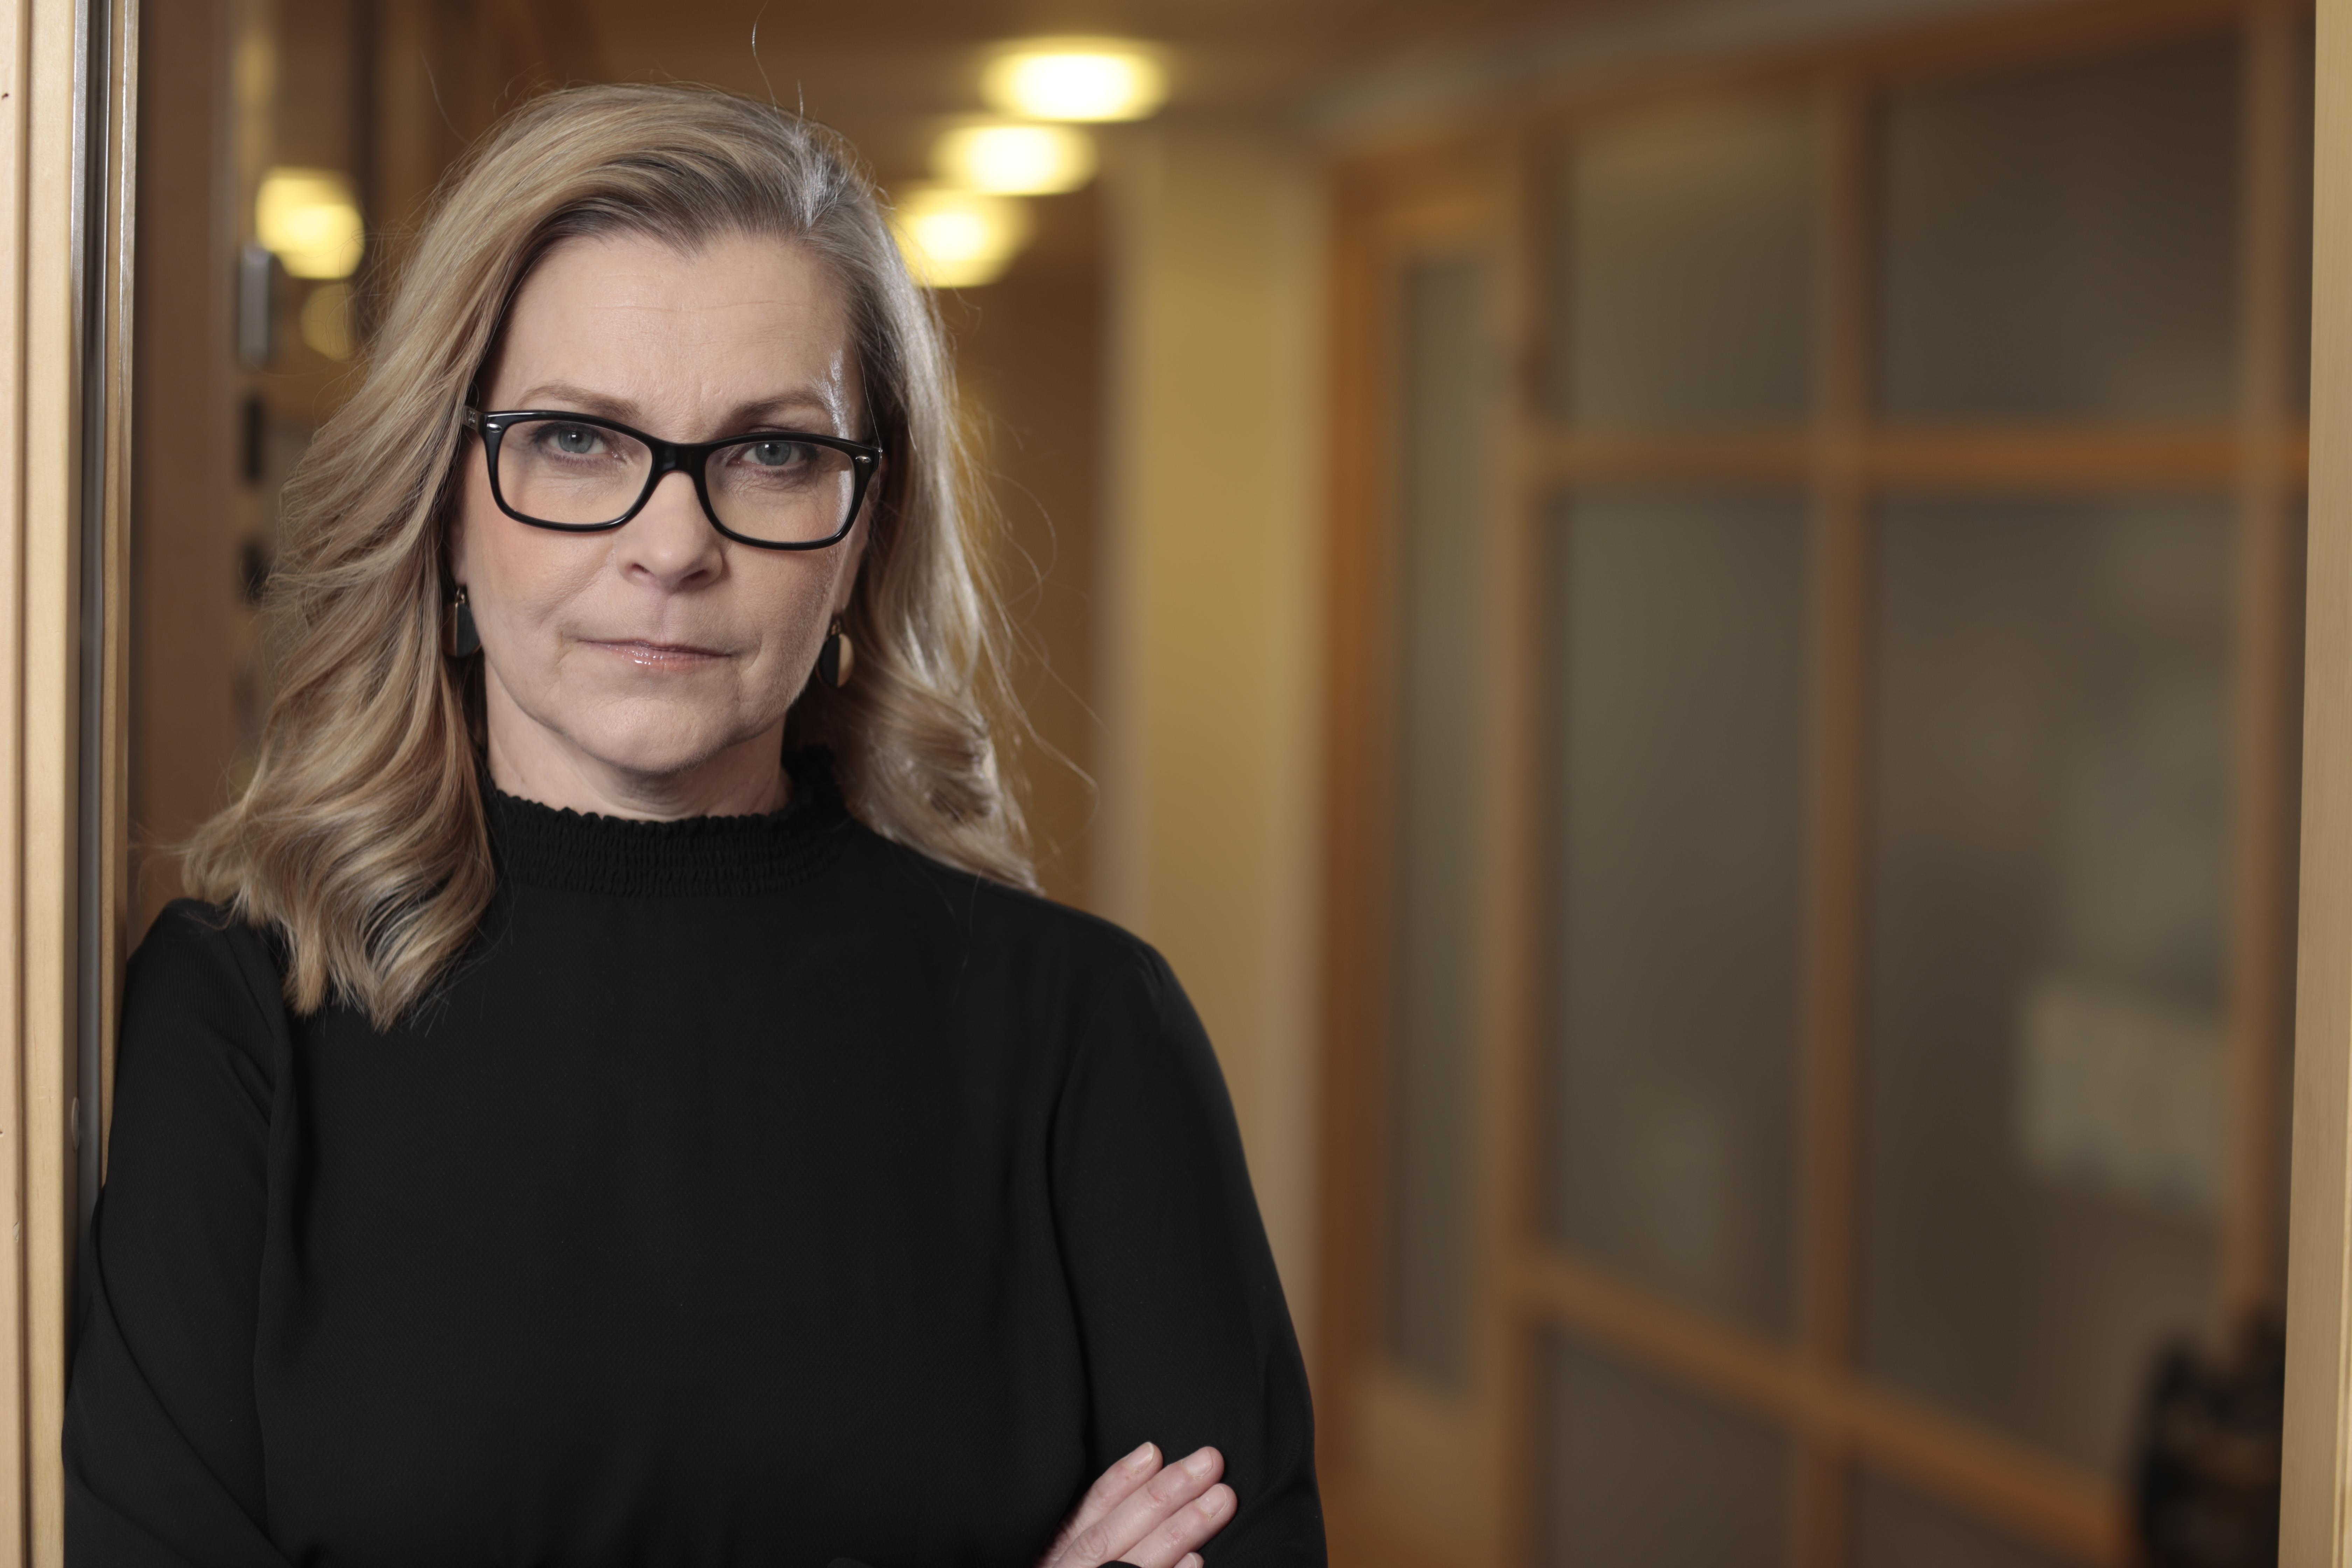 Polisförbundets ordförande Lena Nitz